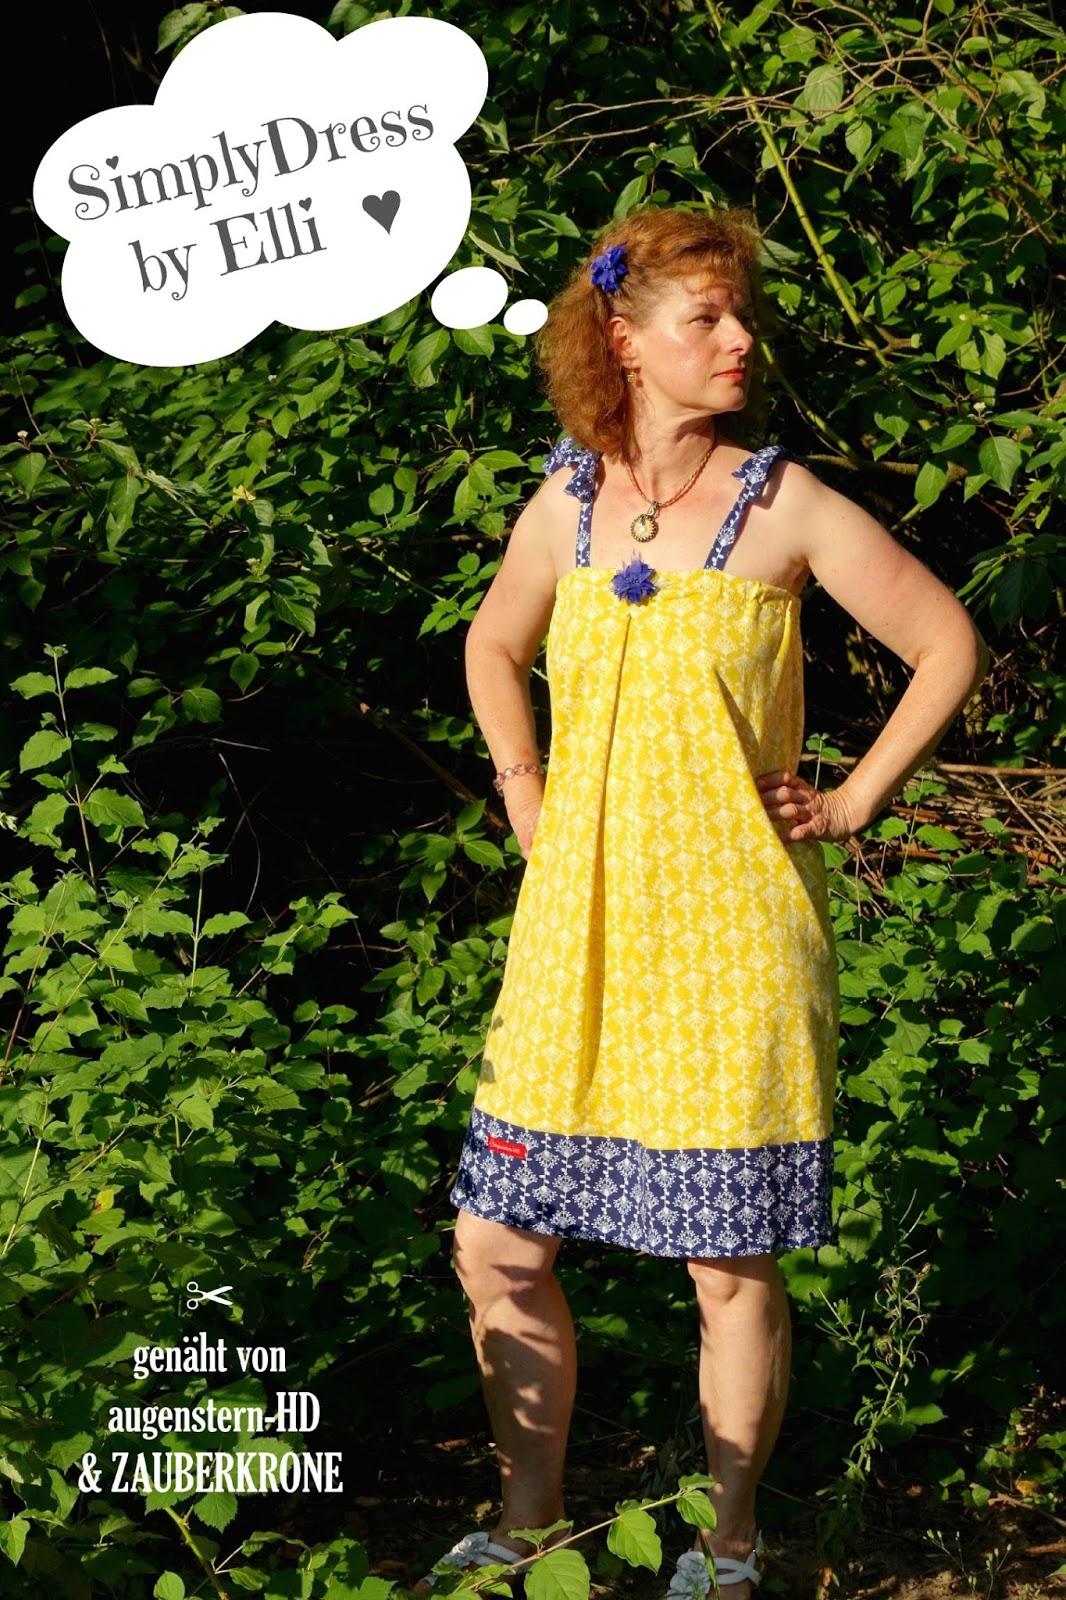 Probenahen Bei Elli Mcpoo Bandeau Kleid Simplydress Augensterns Welt